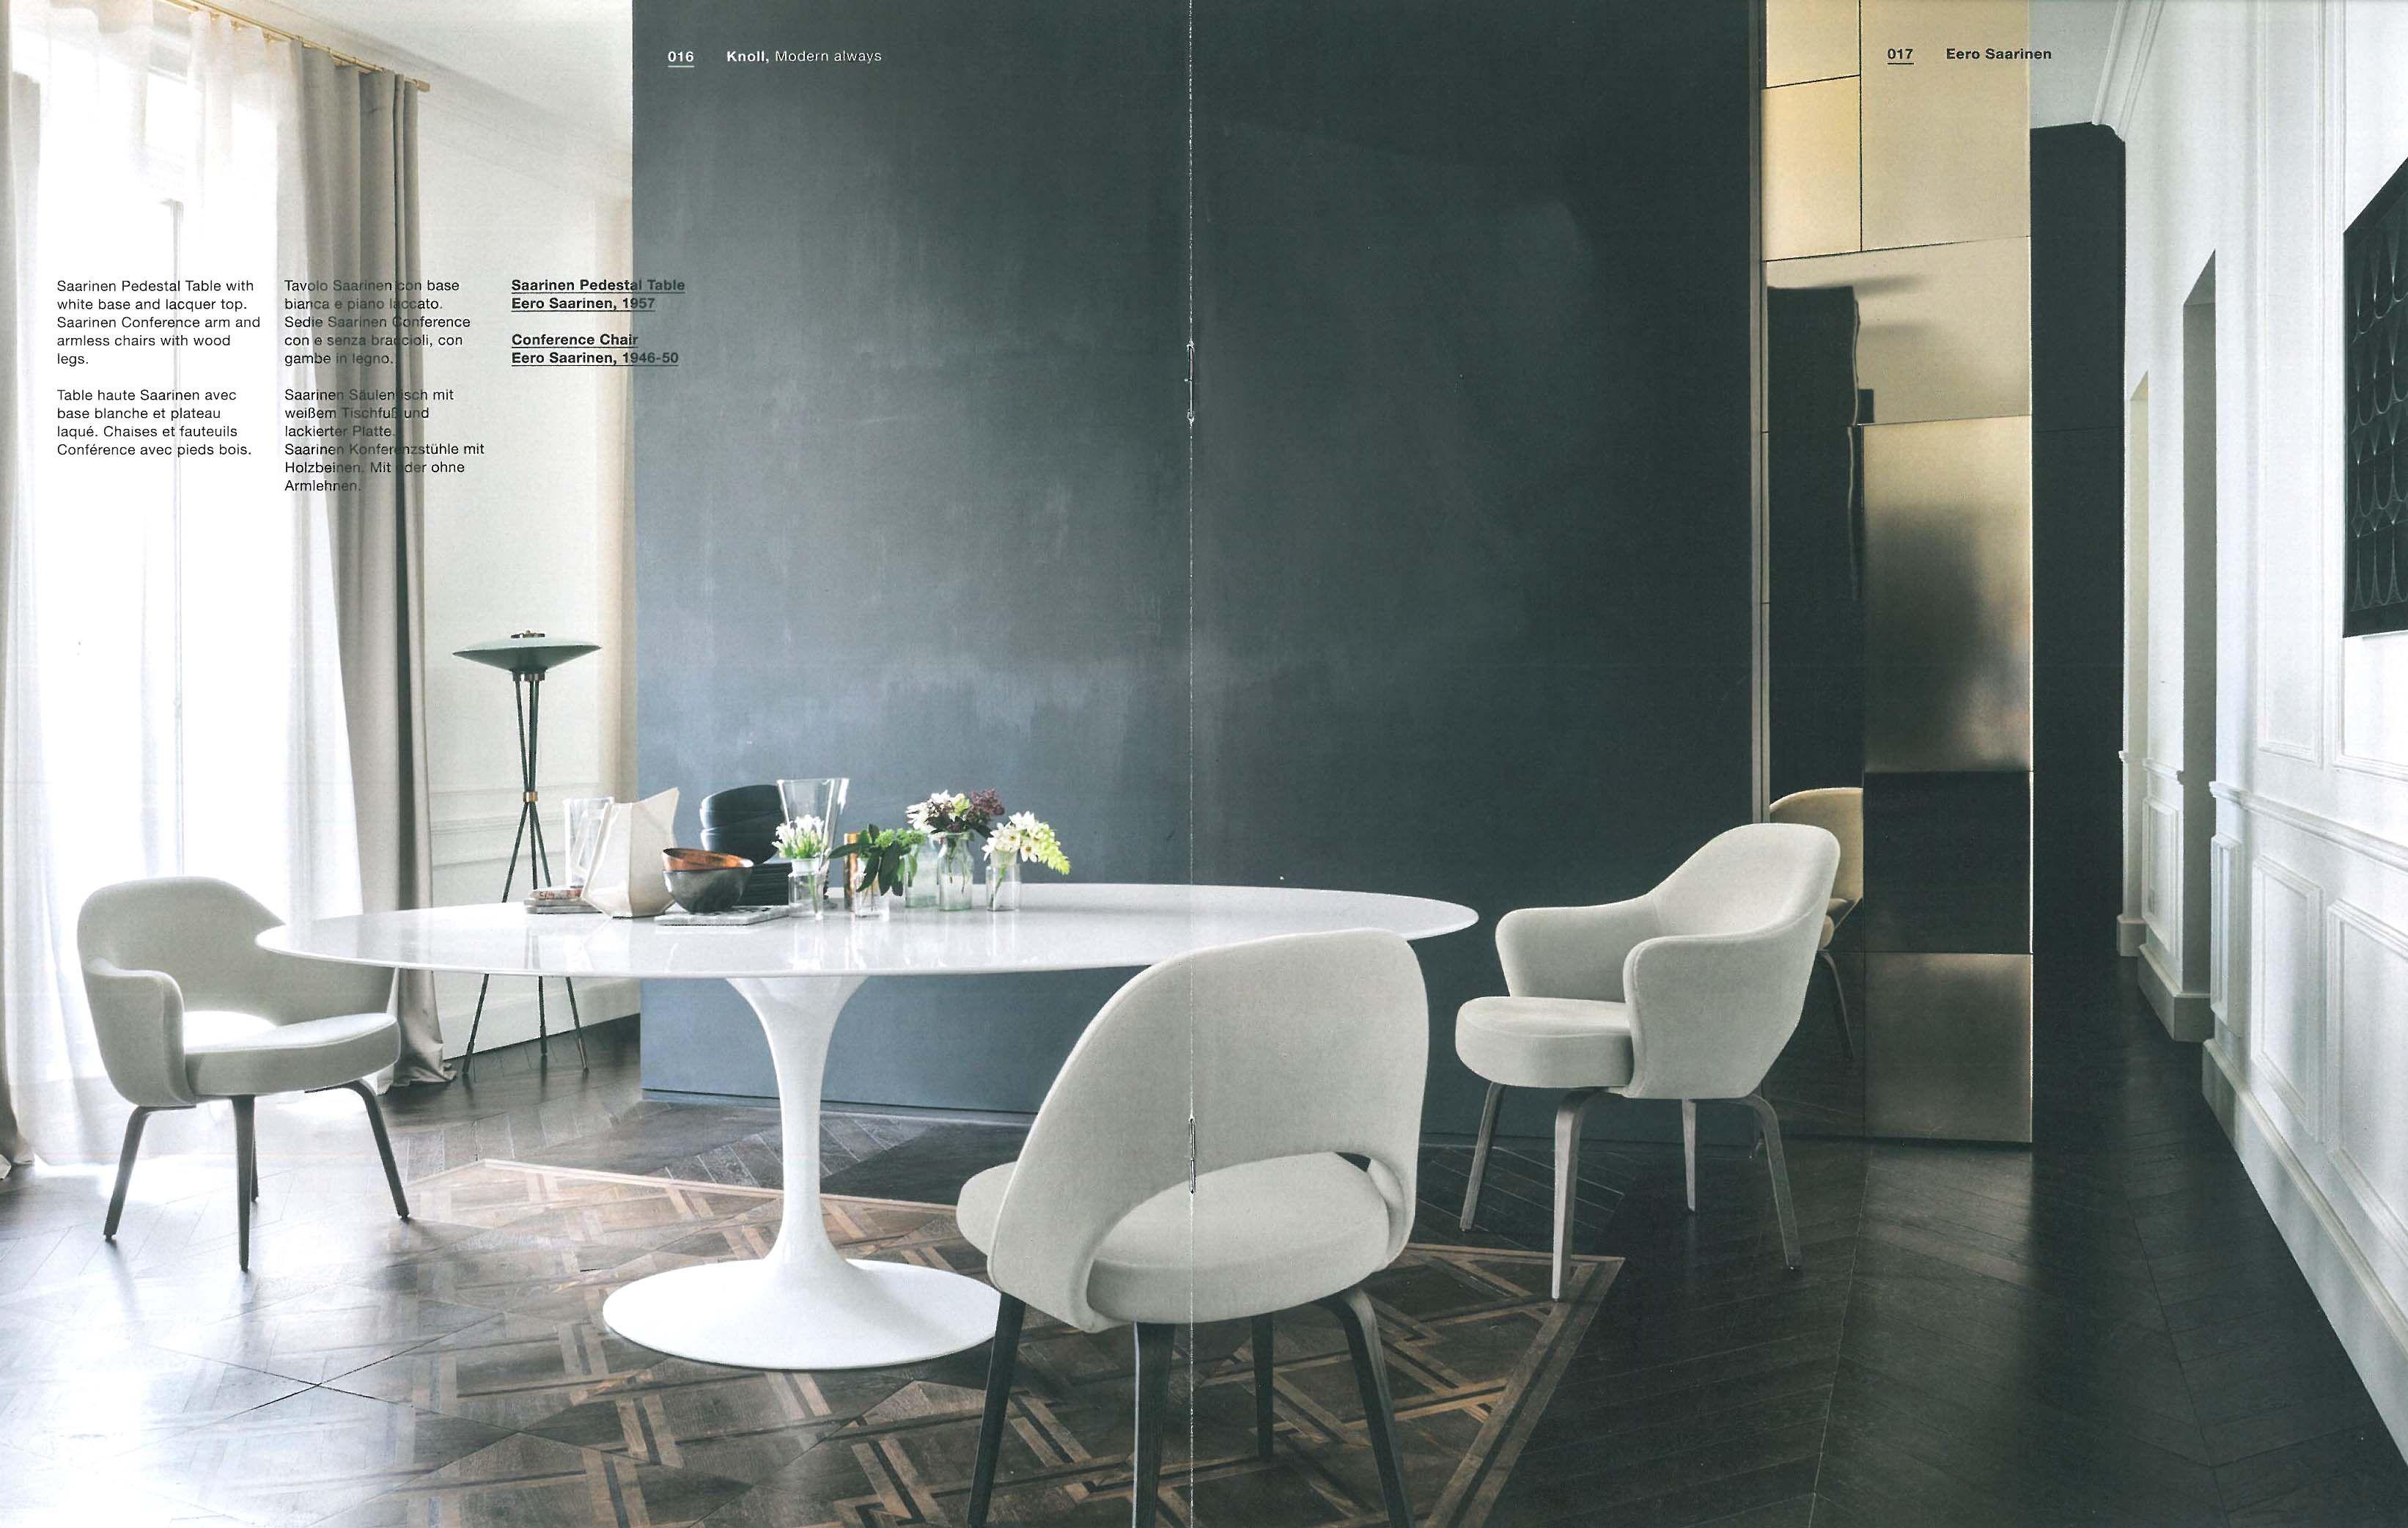 Table Florence Knoll Prix tulip table + saarinen executive chairs | saarinen dining